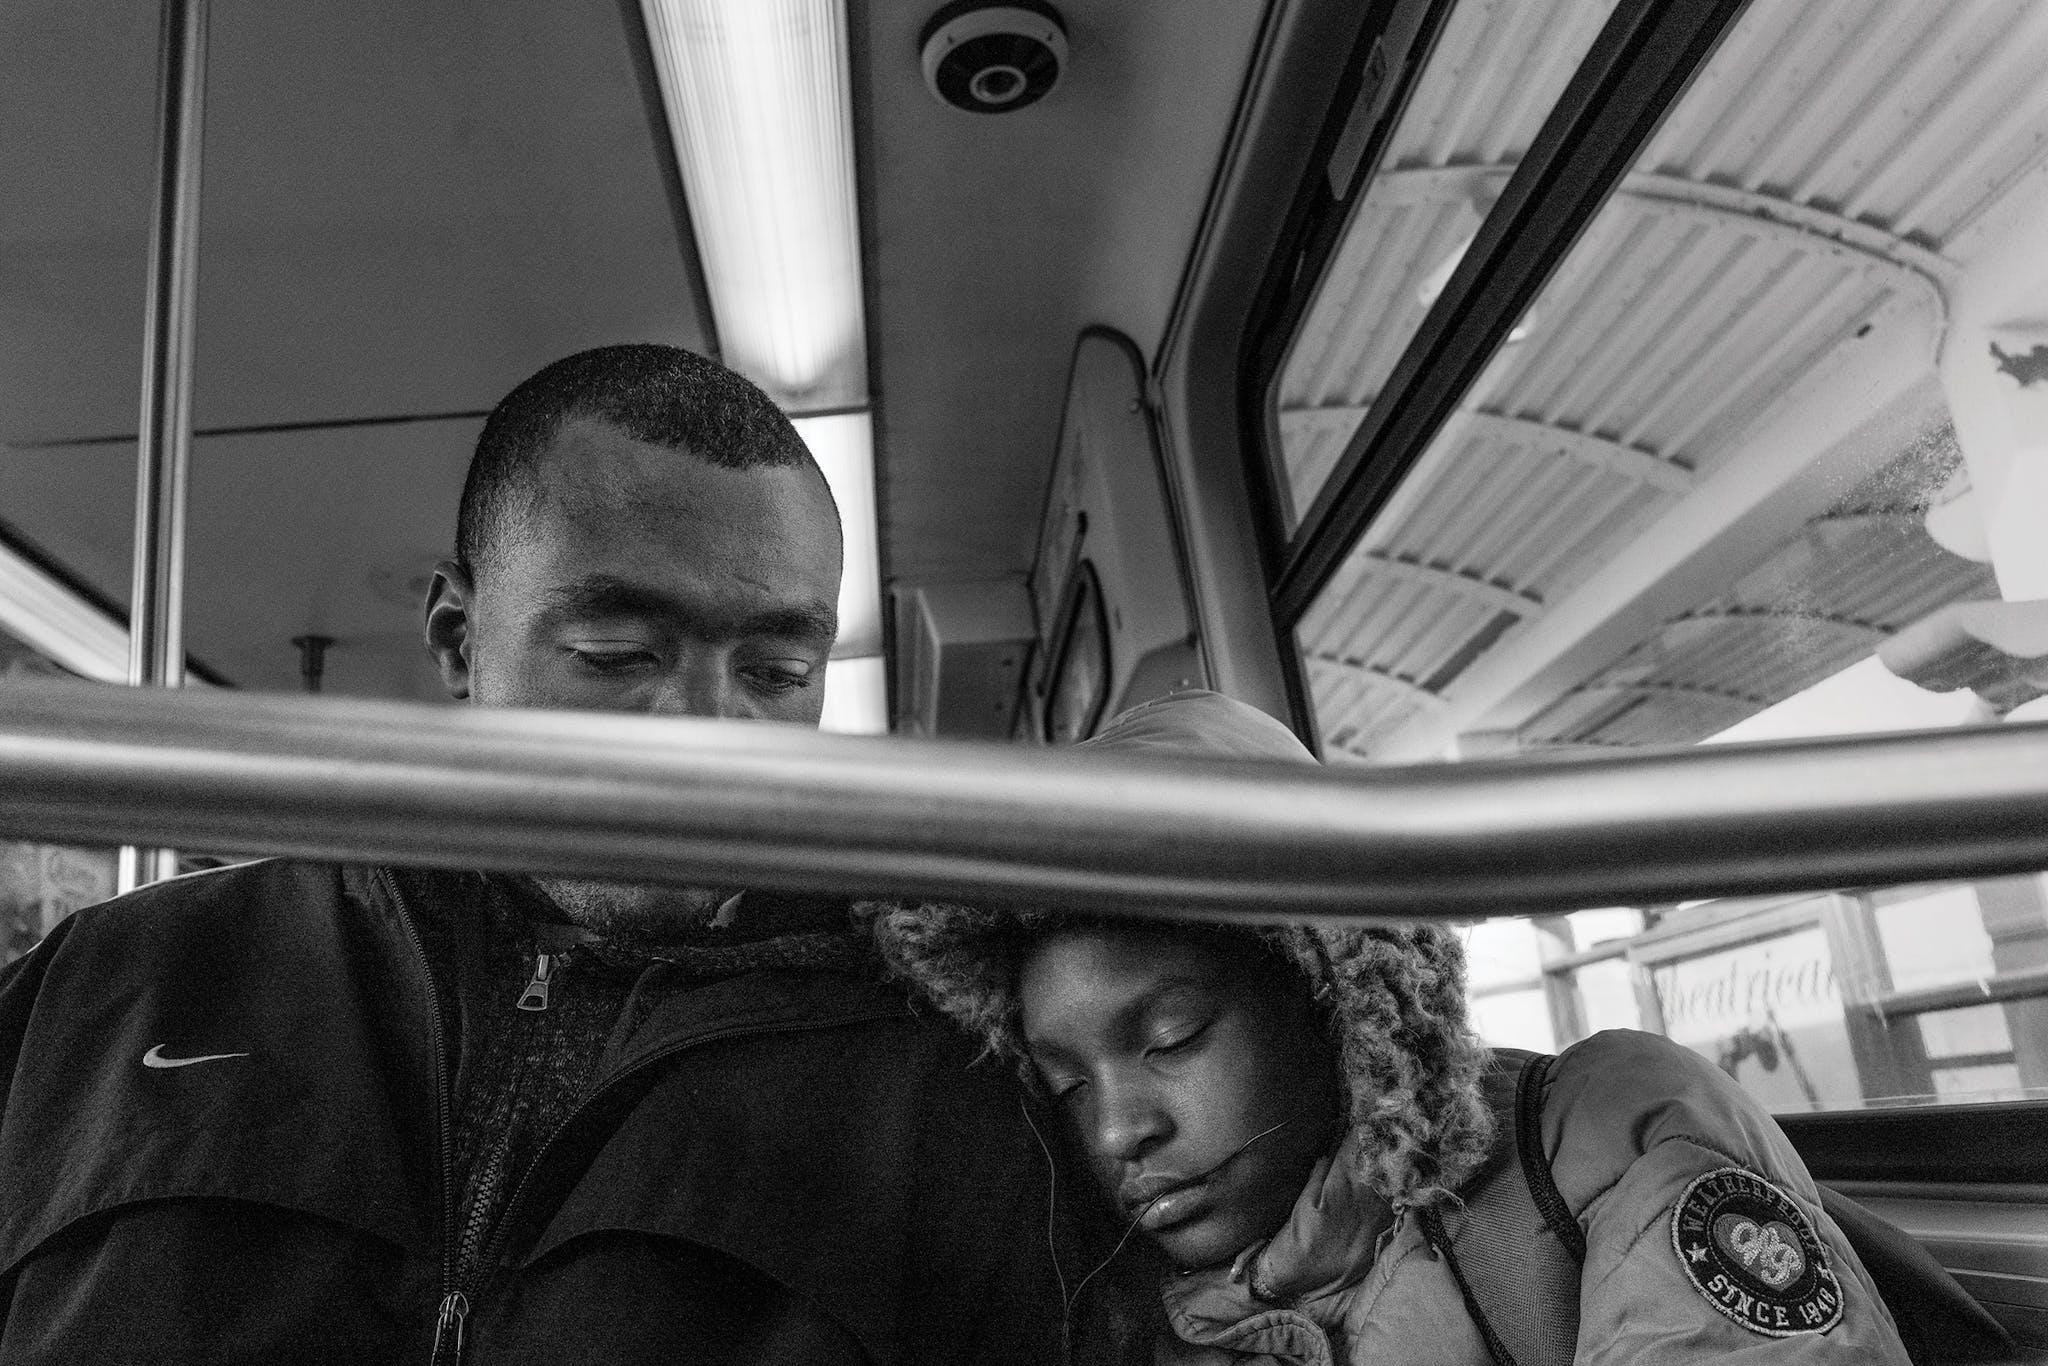 Twelve-year-old Devaiyah Buckner sleeps on her father Patrick's shoulder on the train ride back from school.